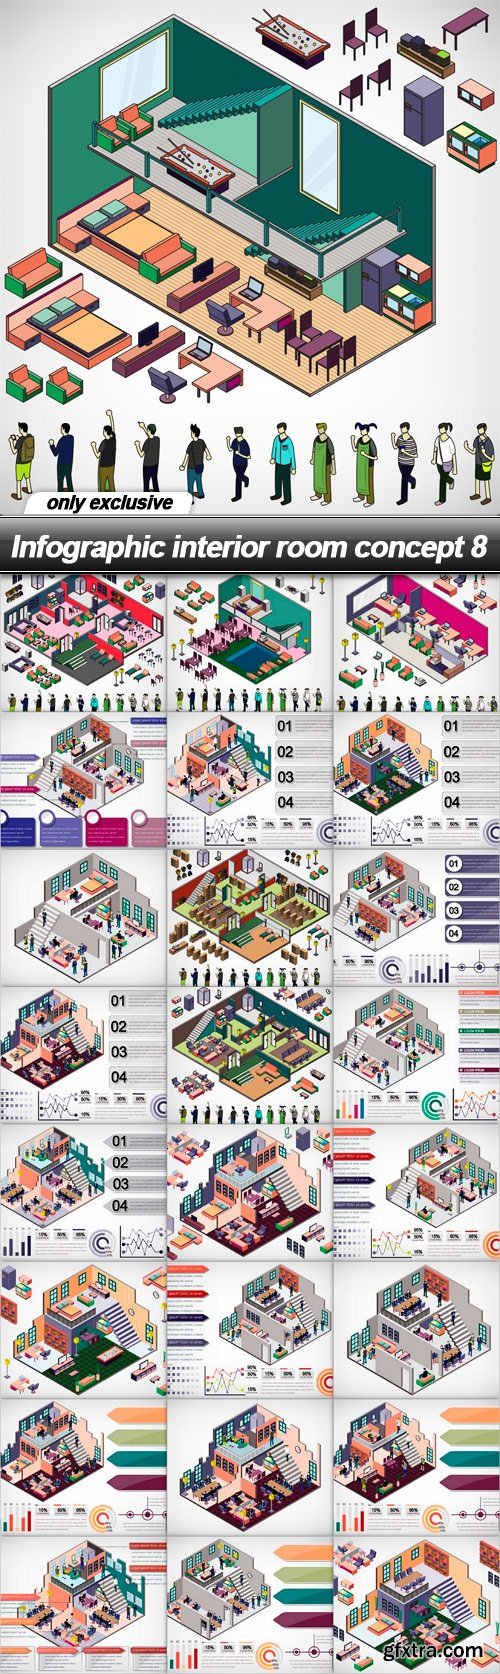 Infographic interior room concept 8 - 25 EPS